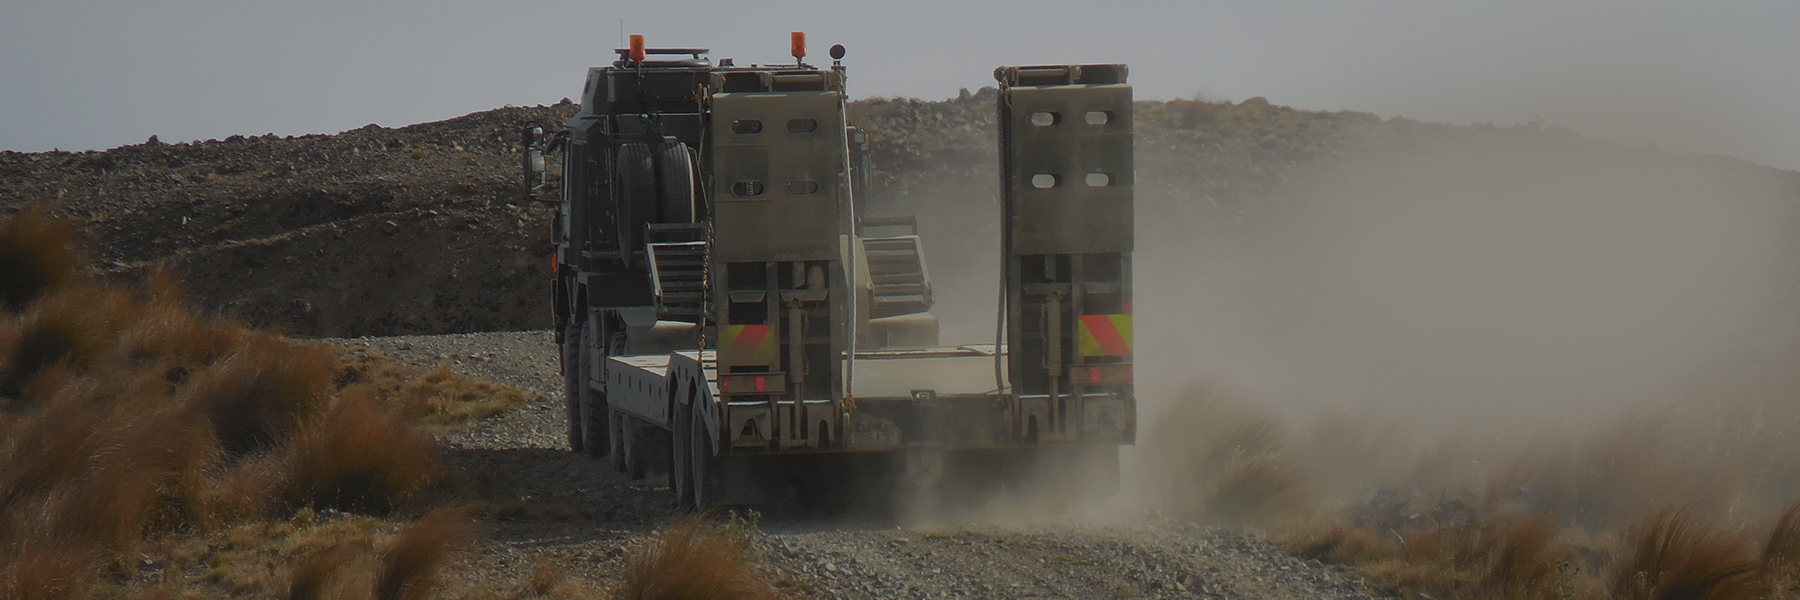 Defence | Manufacturer & Supplier | NZDF & ADF | TRT - Tidd